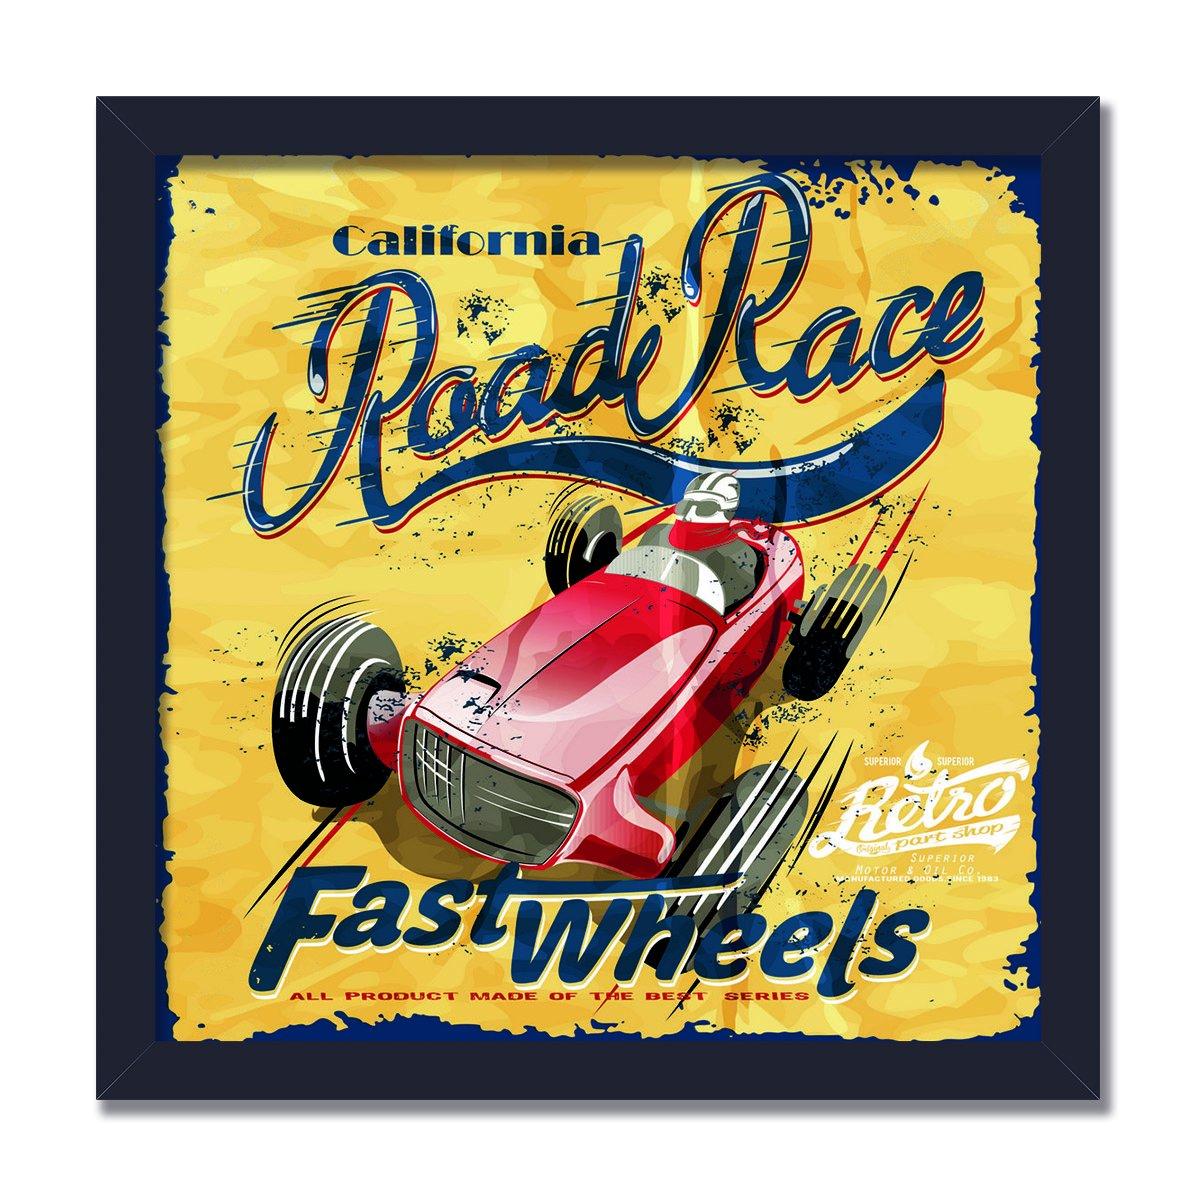 Quadro Decorativo Road Race Fast Wheels Kiaga